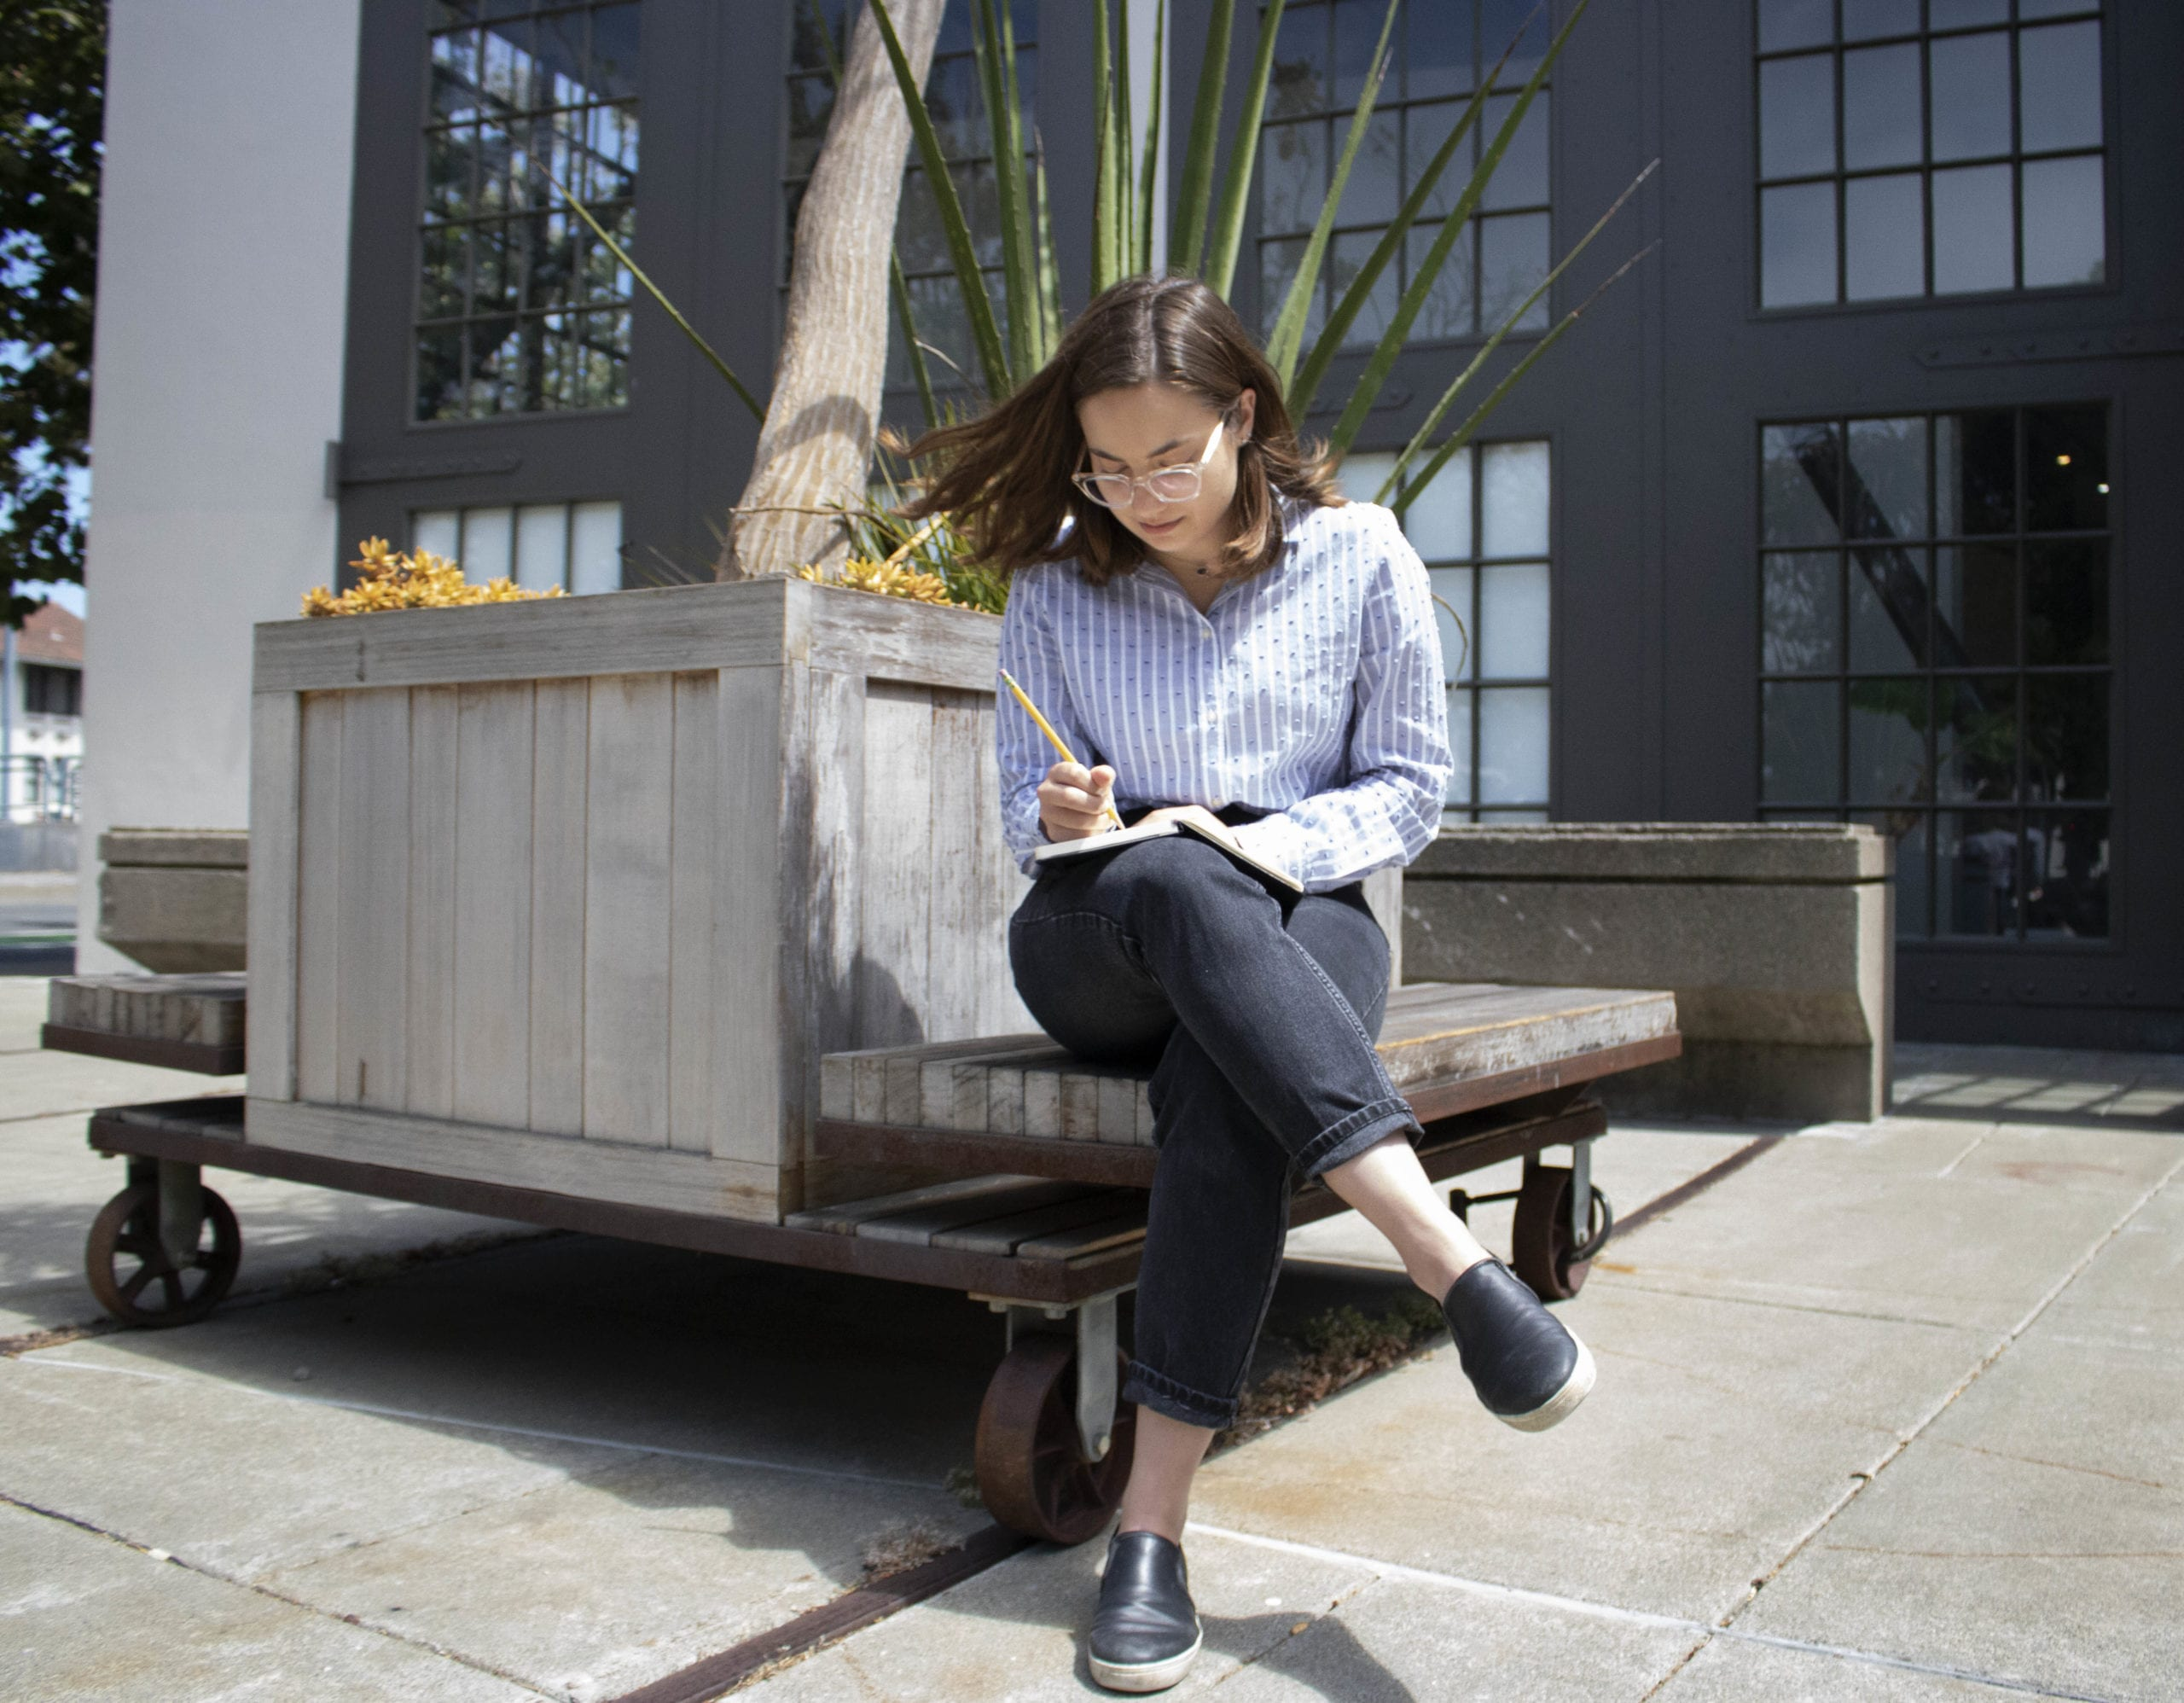 Kate Silber at her MKThink summer internship